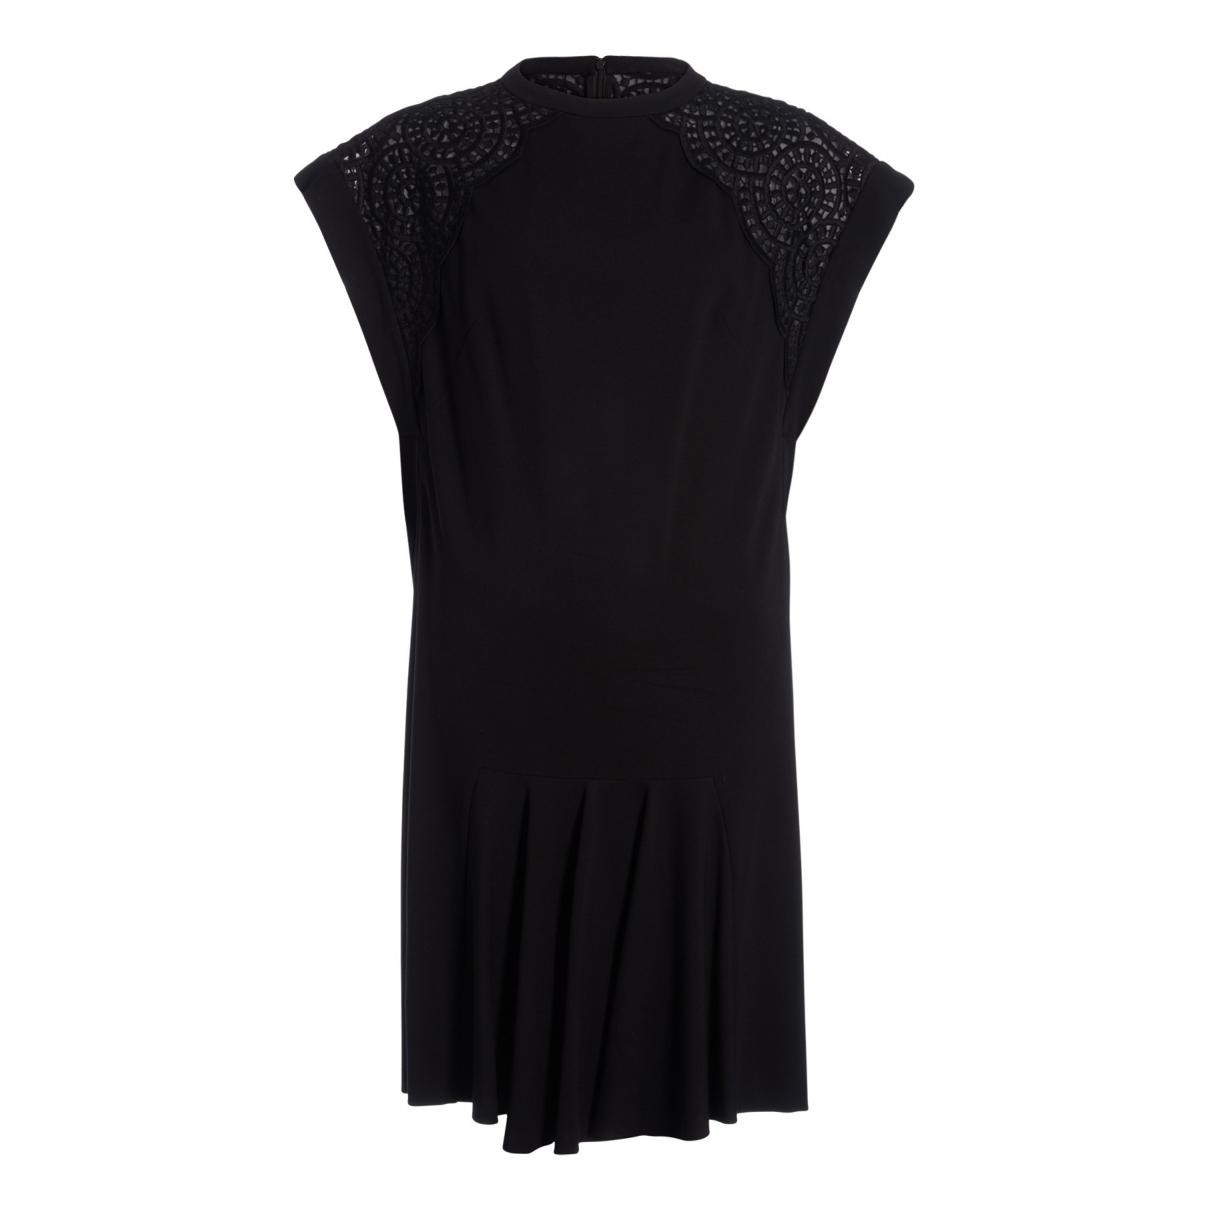 Stella Mccartney N Black Cotton dress for Women 16 UK